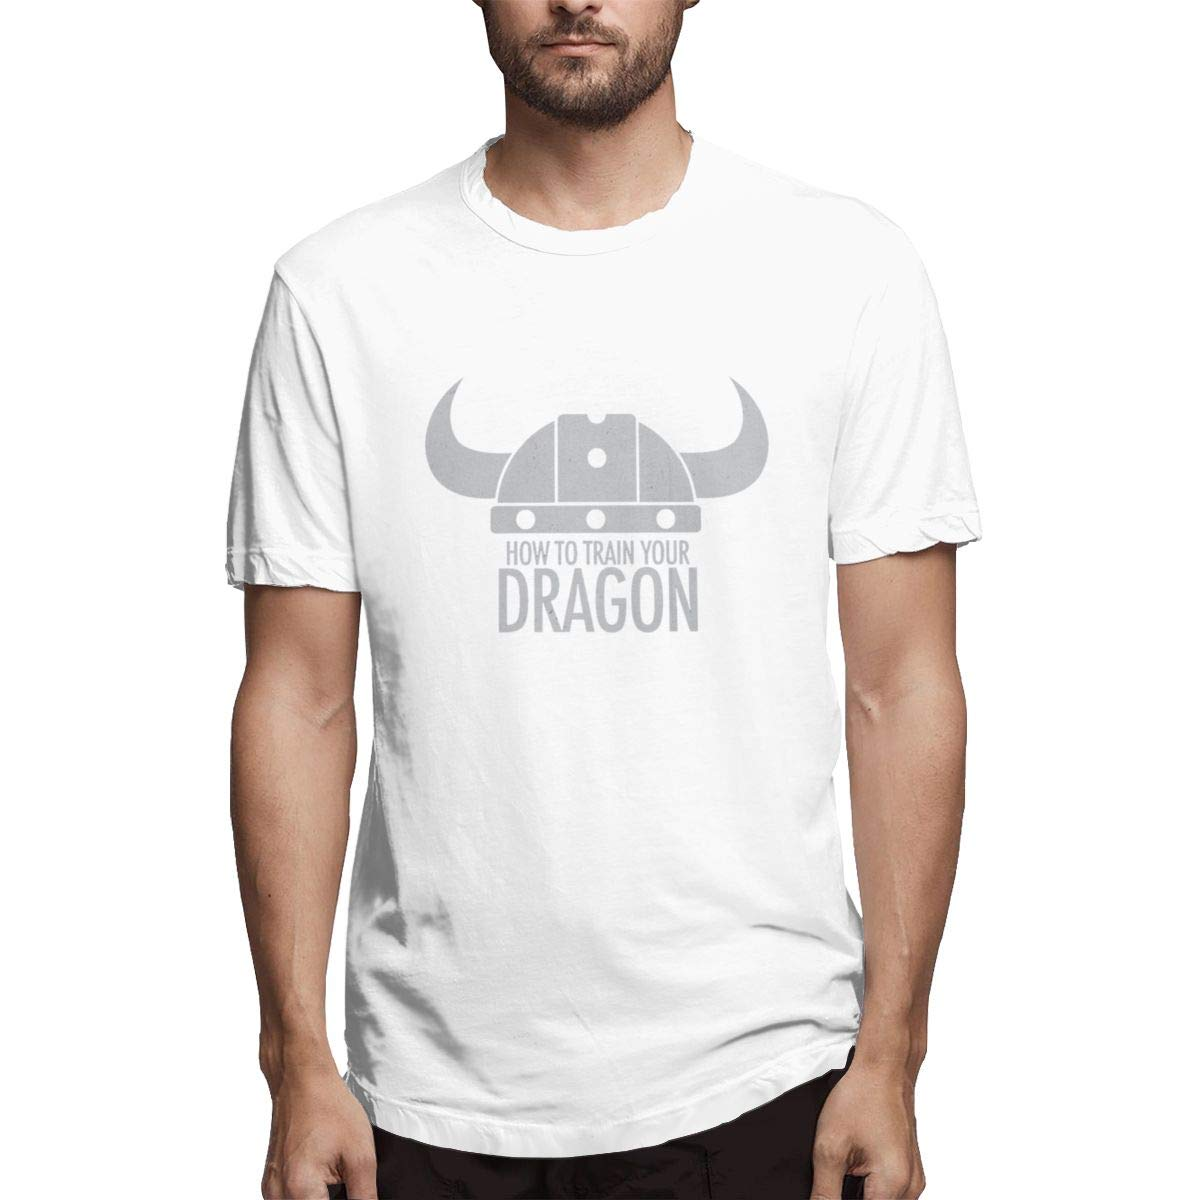 VIIHAHN Men Design How to Train Your Dragon Tennisround Neck Short Sleeve T Shirt